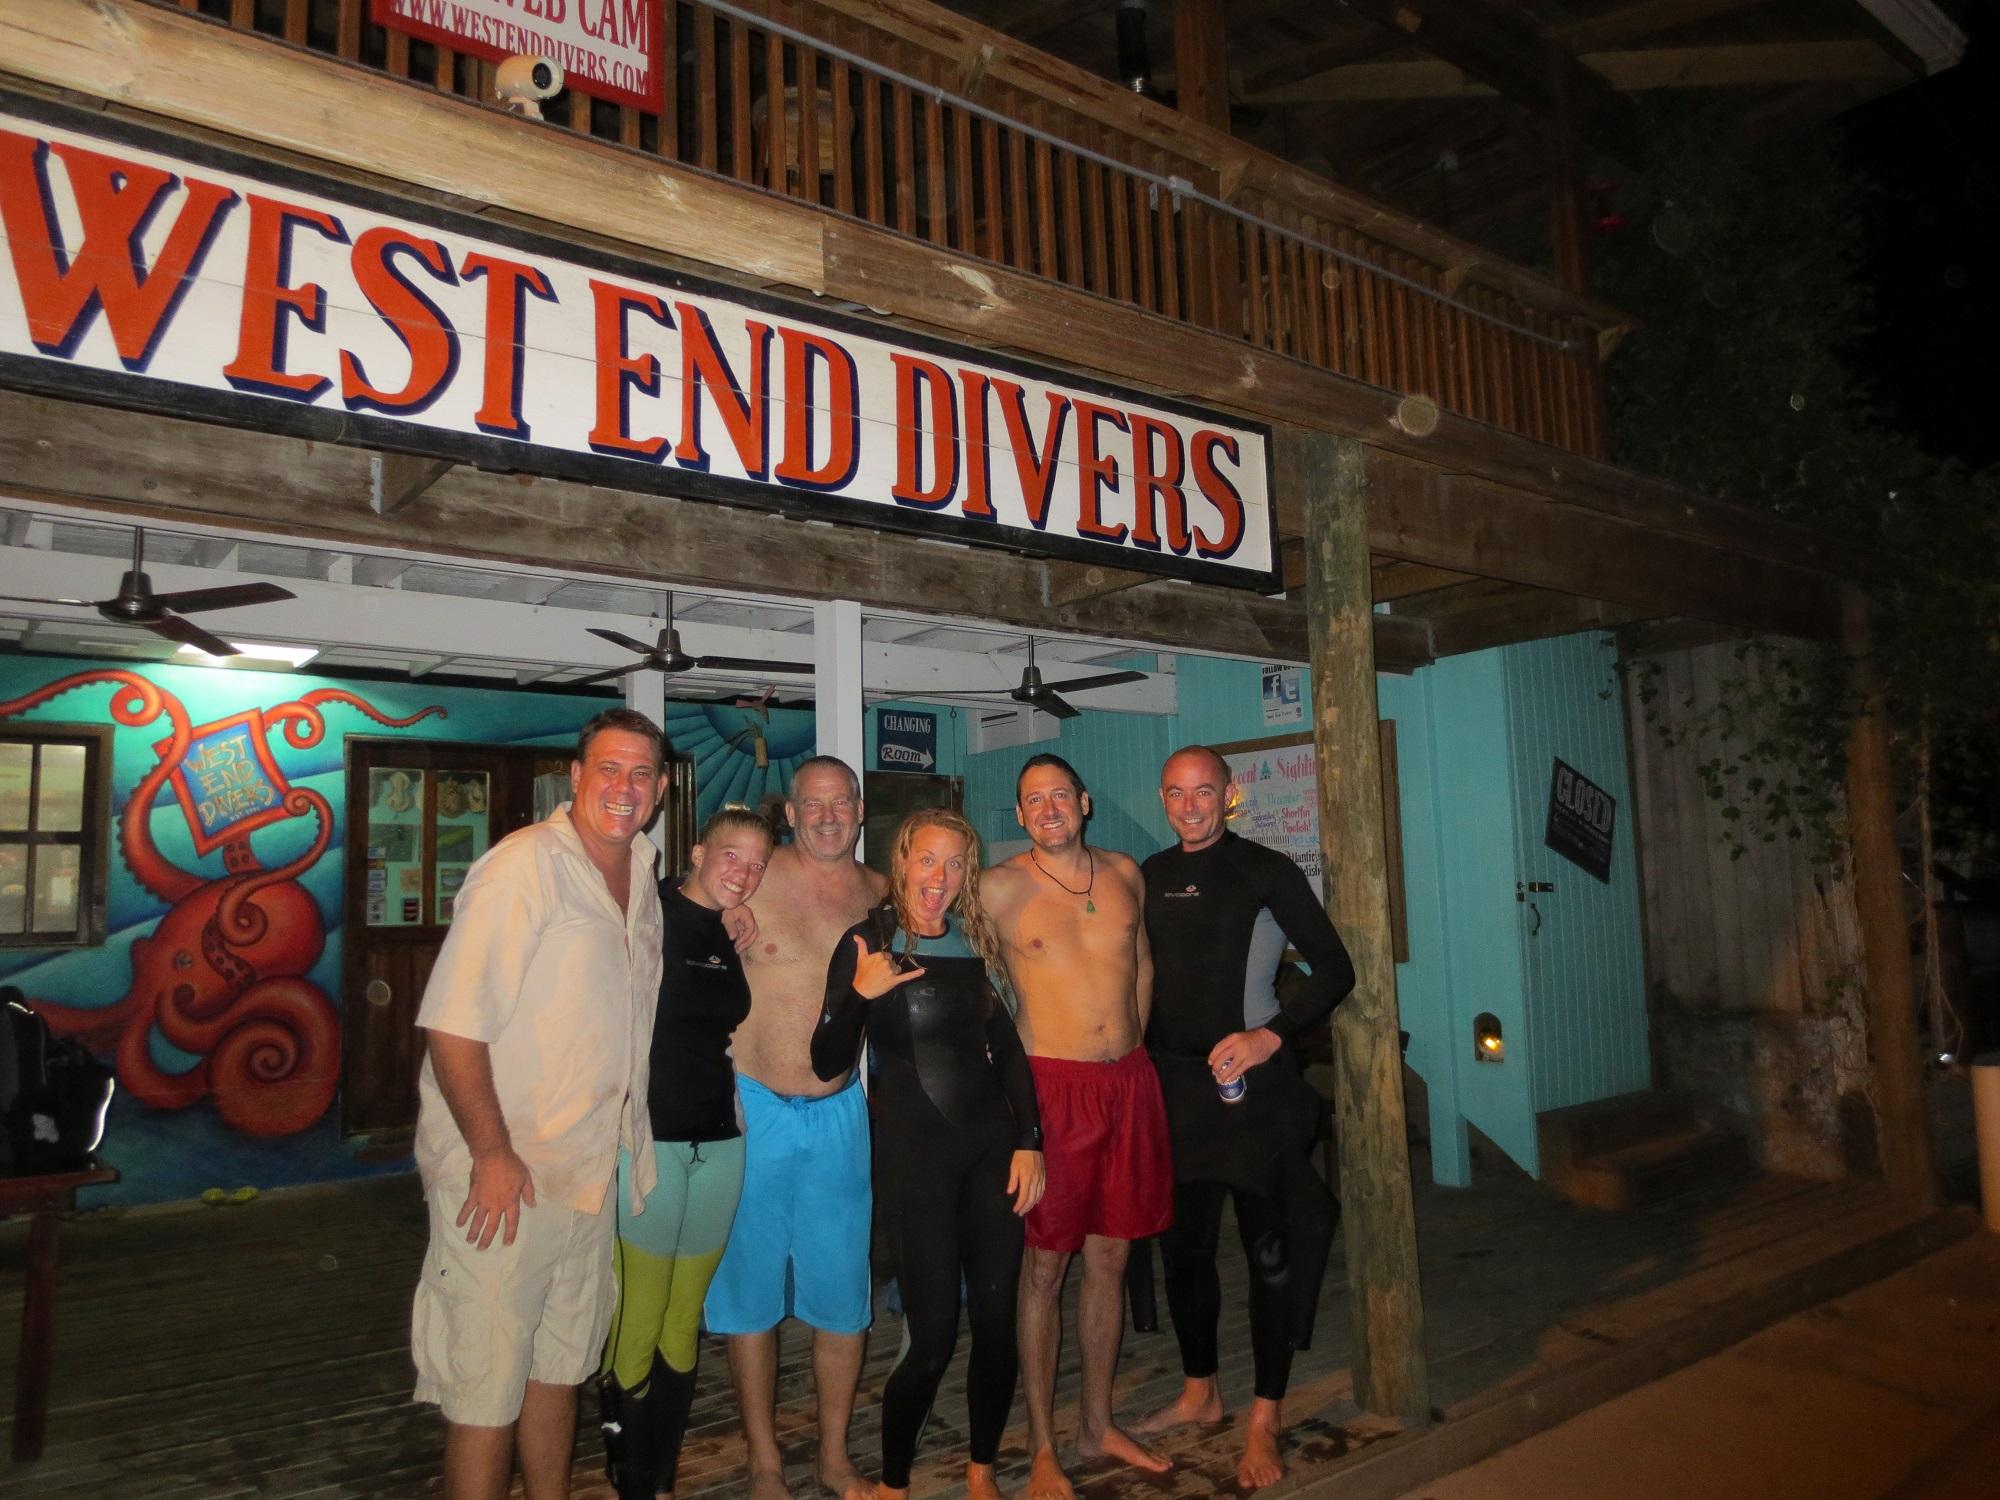 Roatan's First Black Water Divers  - Mickey Charteris, Courtney Blankenship, Tom Thomson, Erica Morgan, Brett Kroos, and Andy Dixon